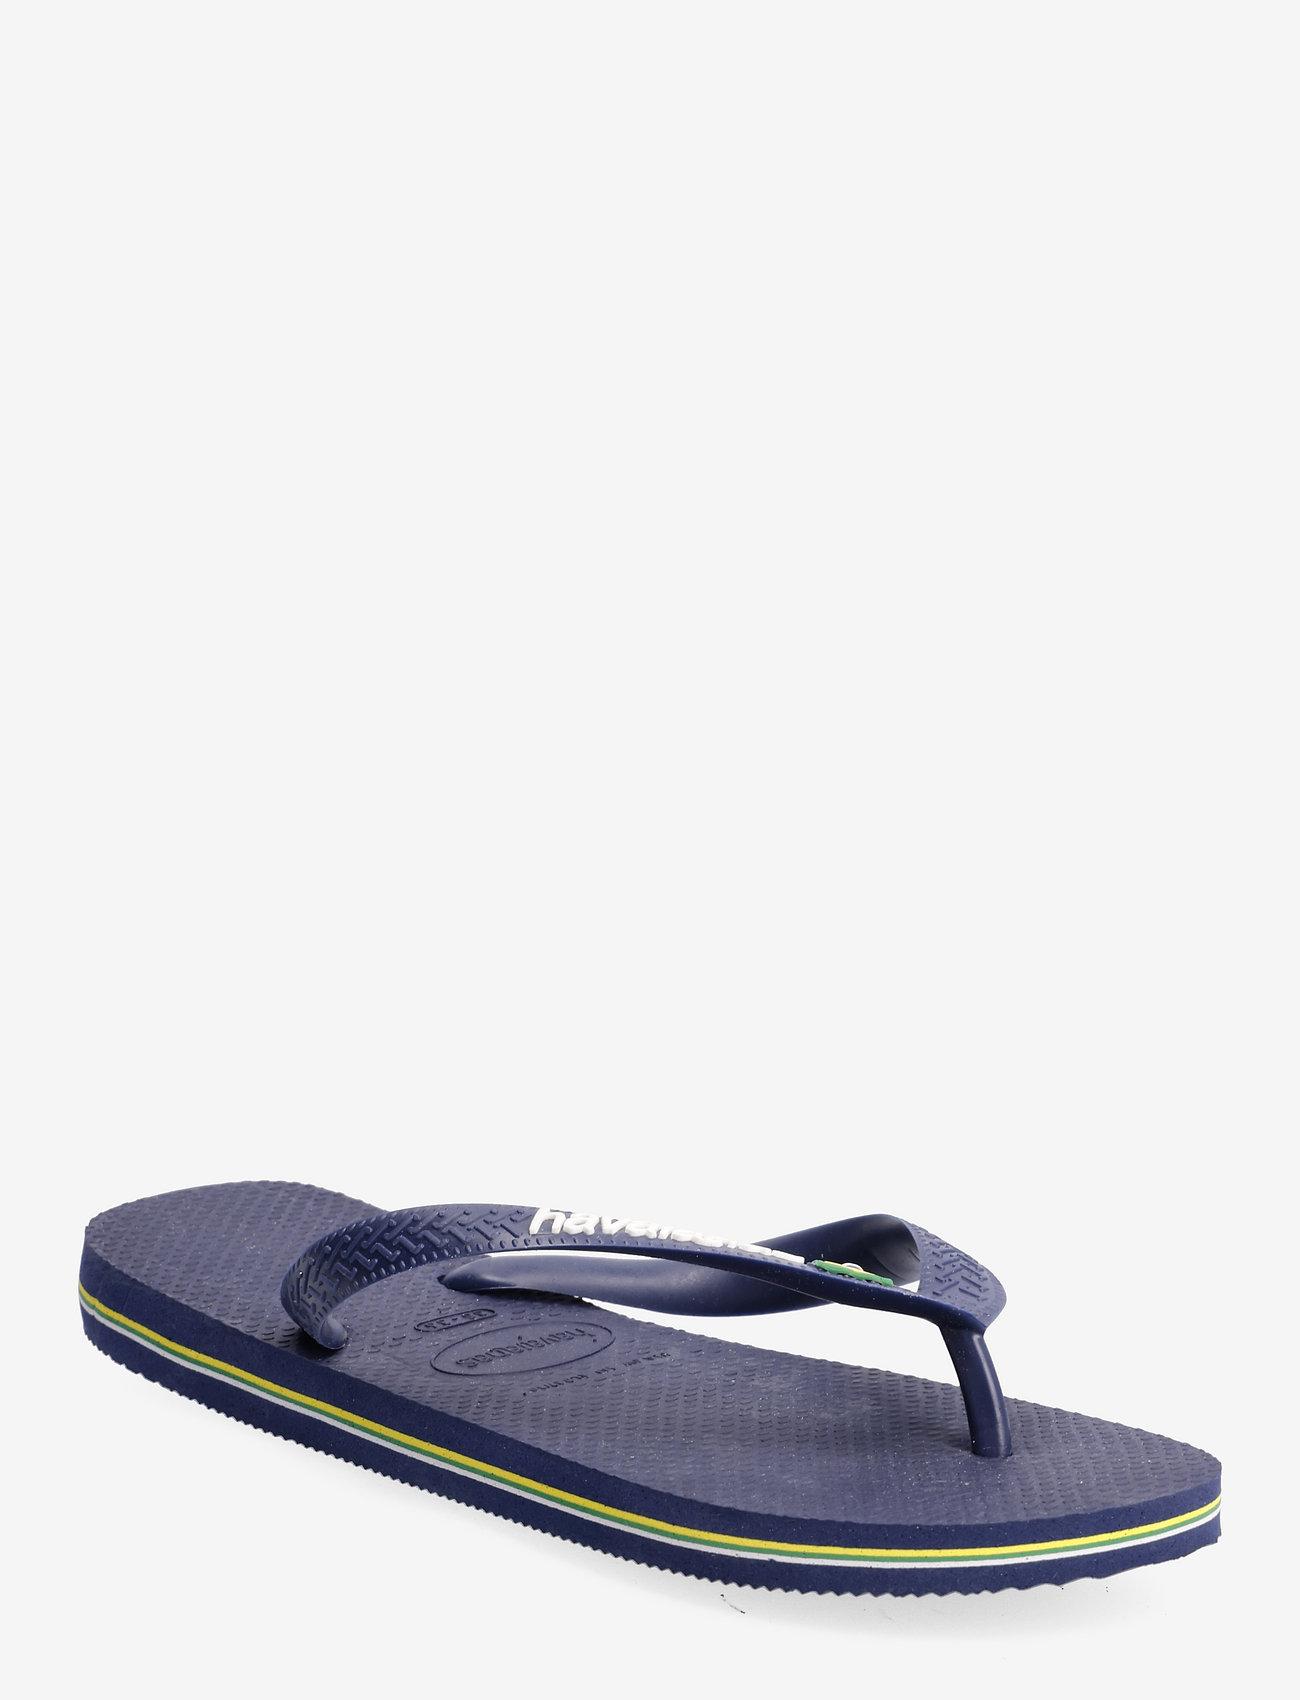 Havaianas - BRASIL LOGO FLIP FLOP - slipper - blue - 0